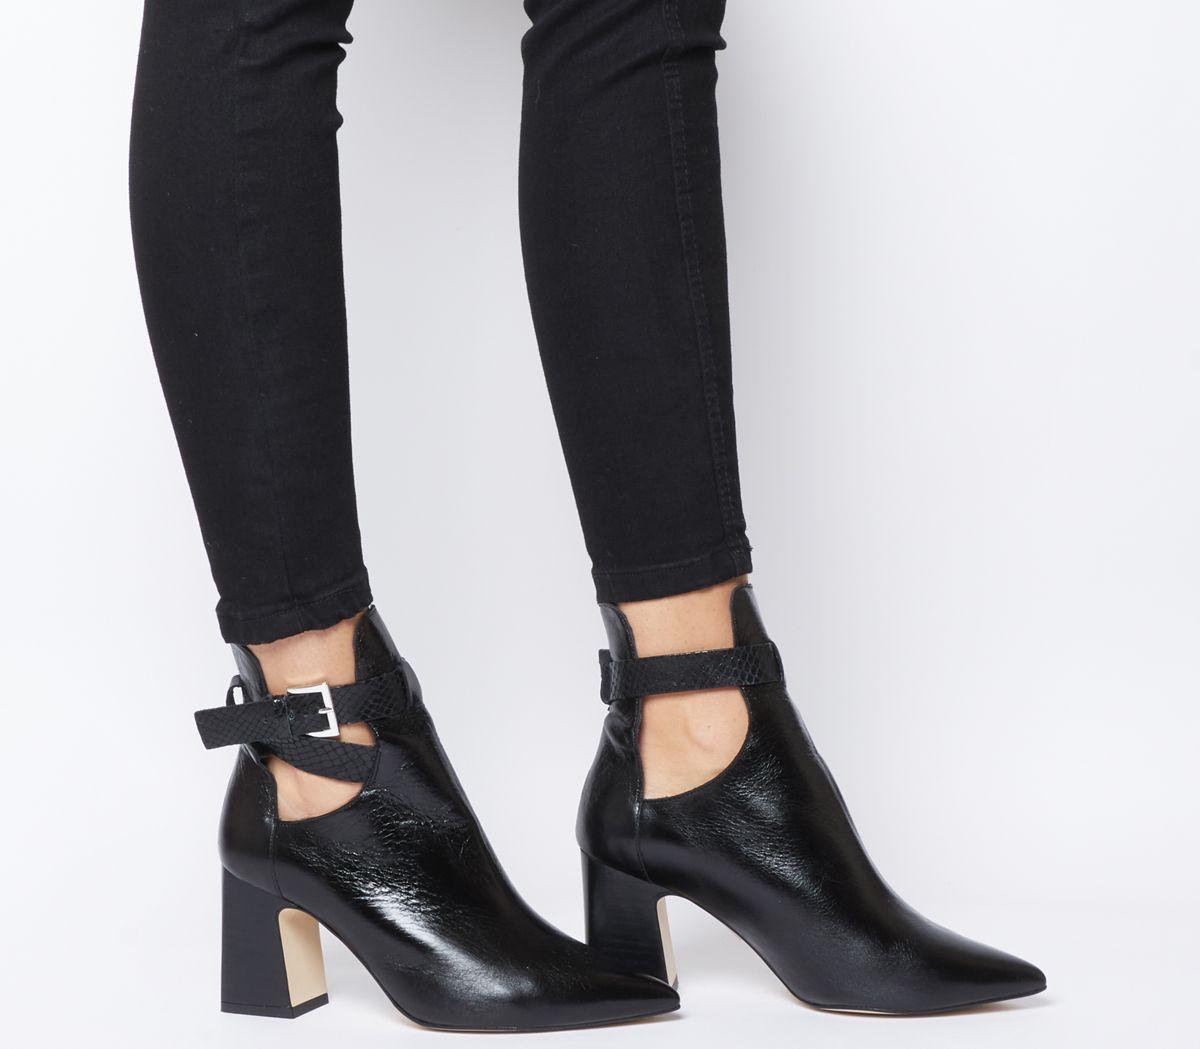 d6129abffb6 Alternative Cut Out Block Heel Boots